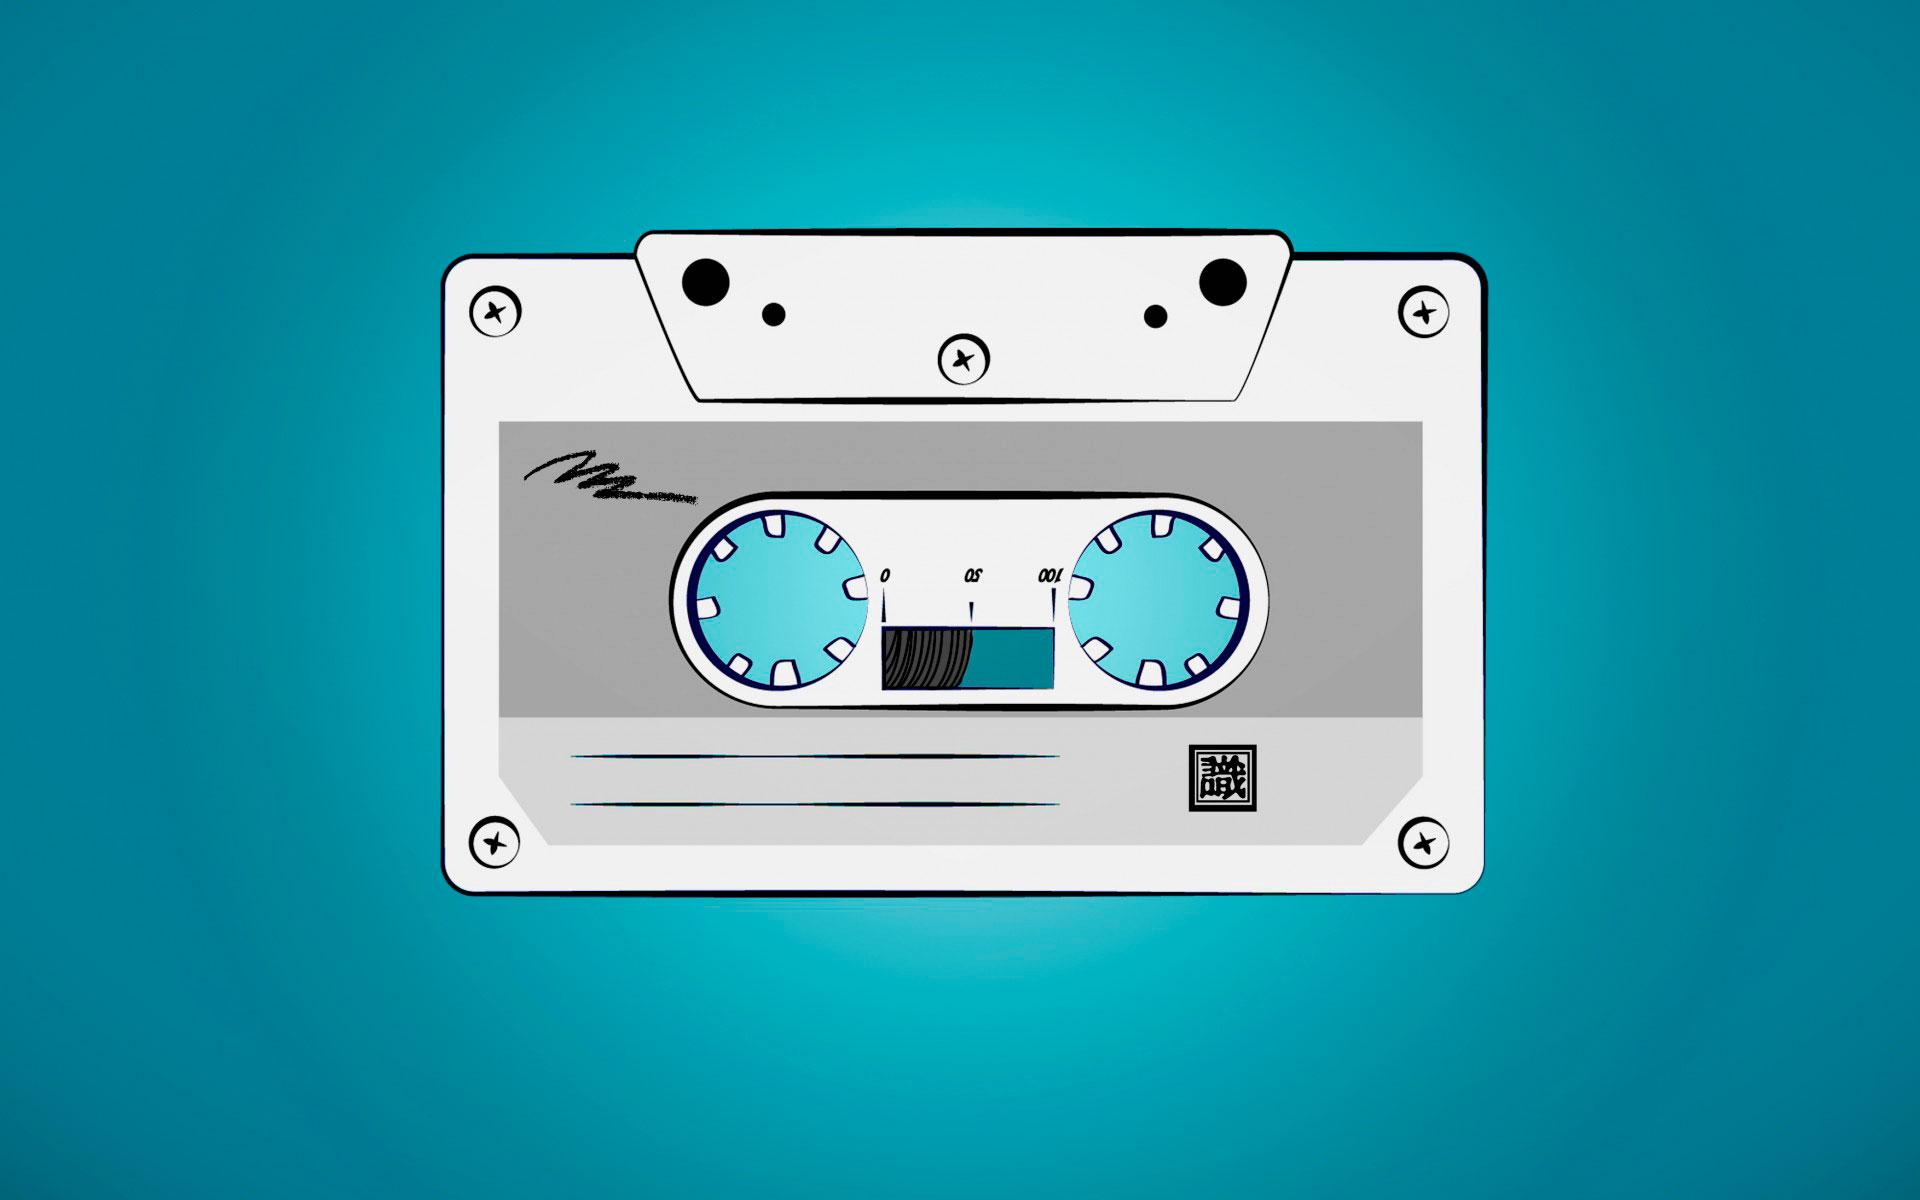 где взять музыку для инстаграм?